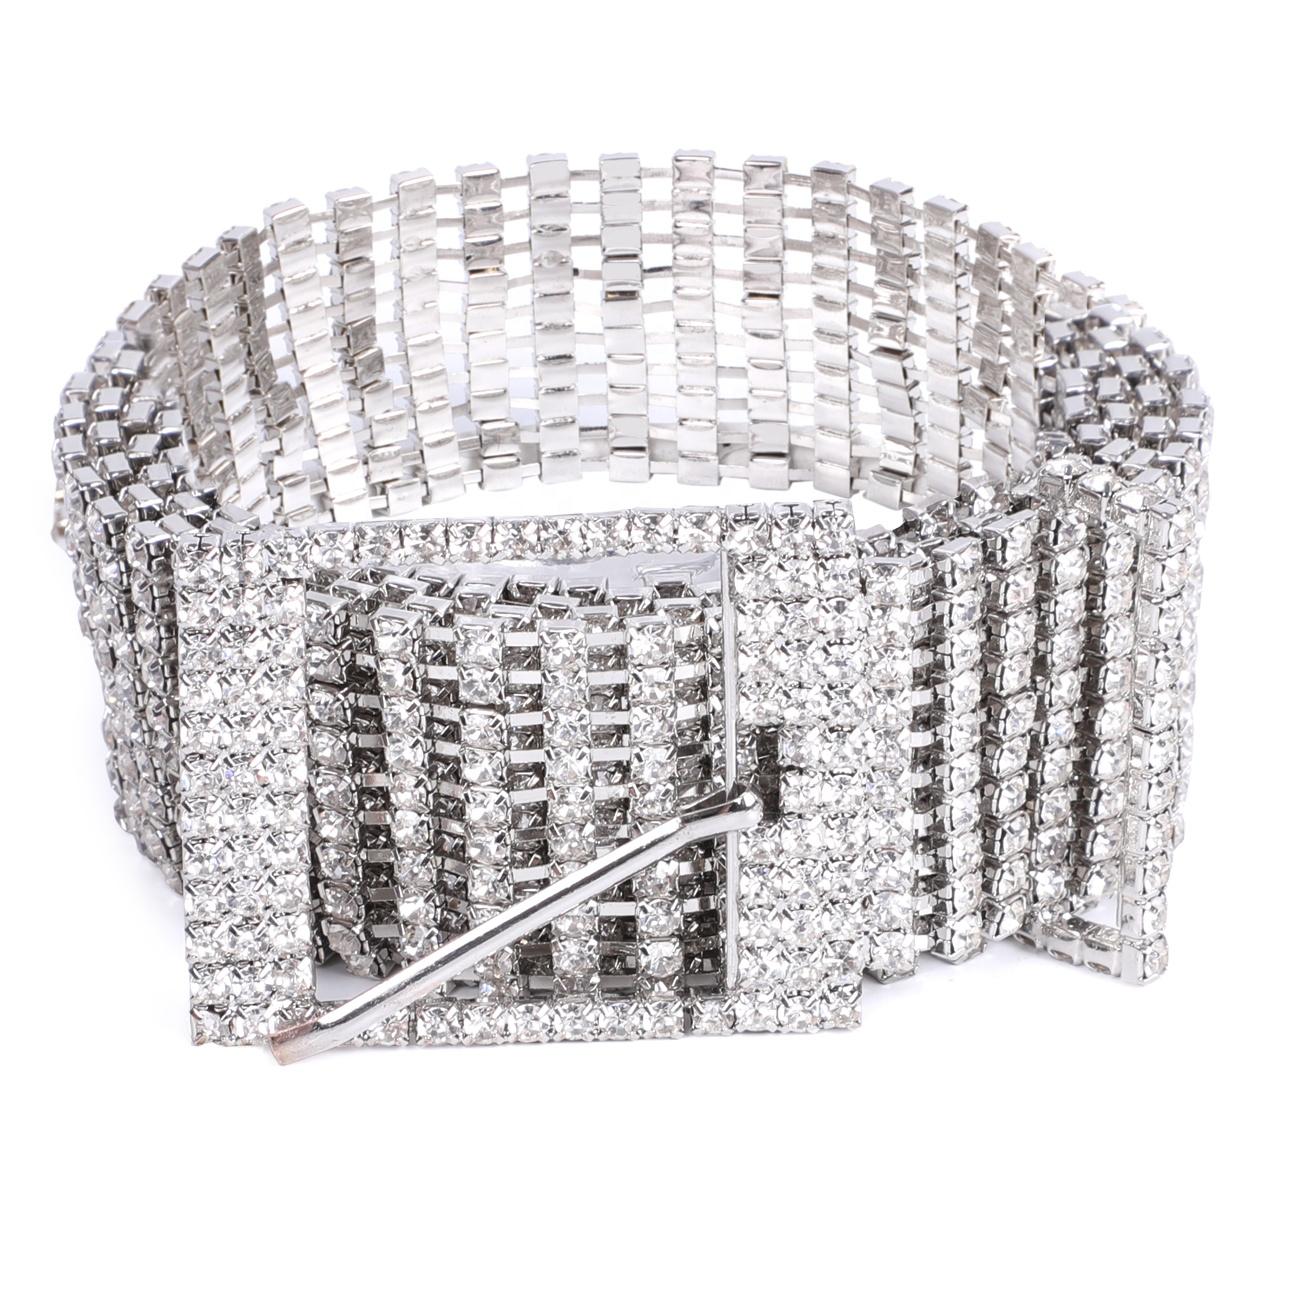 Bling Shiny Belt Full Chain Crystal belt Diamond Rhinestone Studded Sexy Club Pants Jeans Fashion Metal Stylish Belt